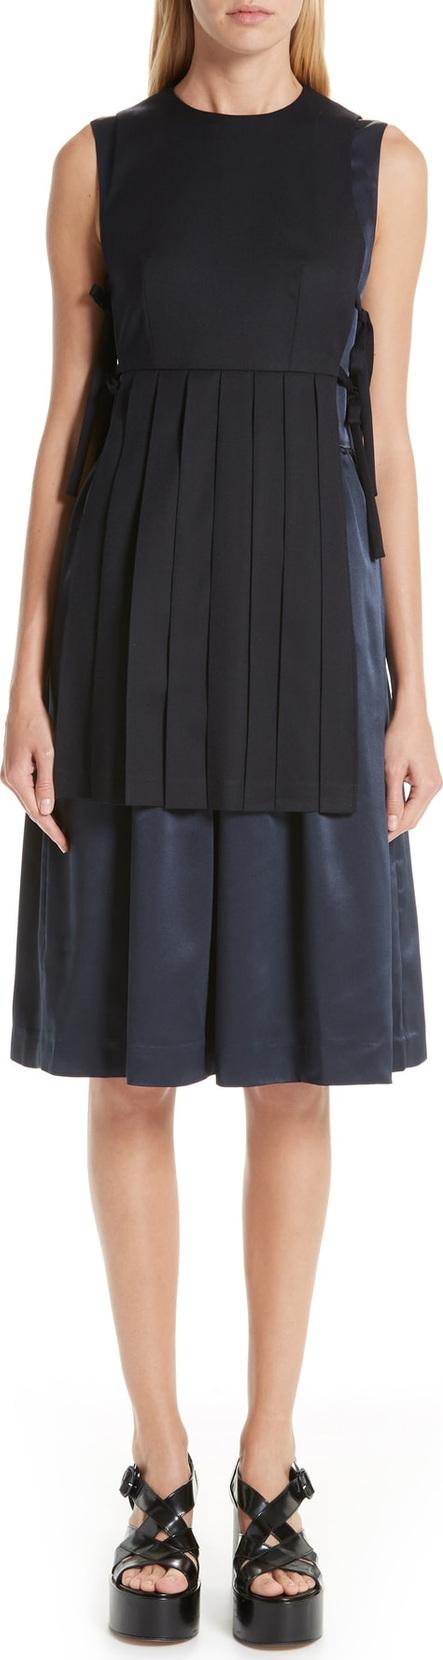 Noir Kei Ninomiya Sleeveless Wool & Satin Dress